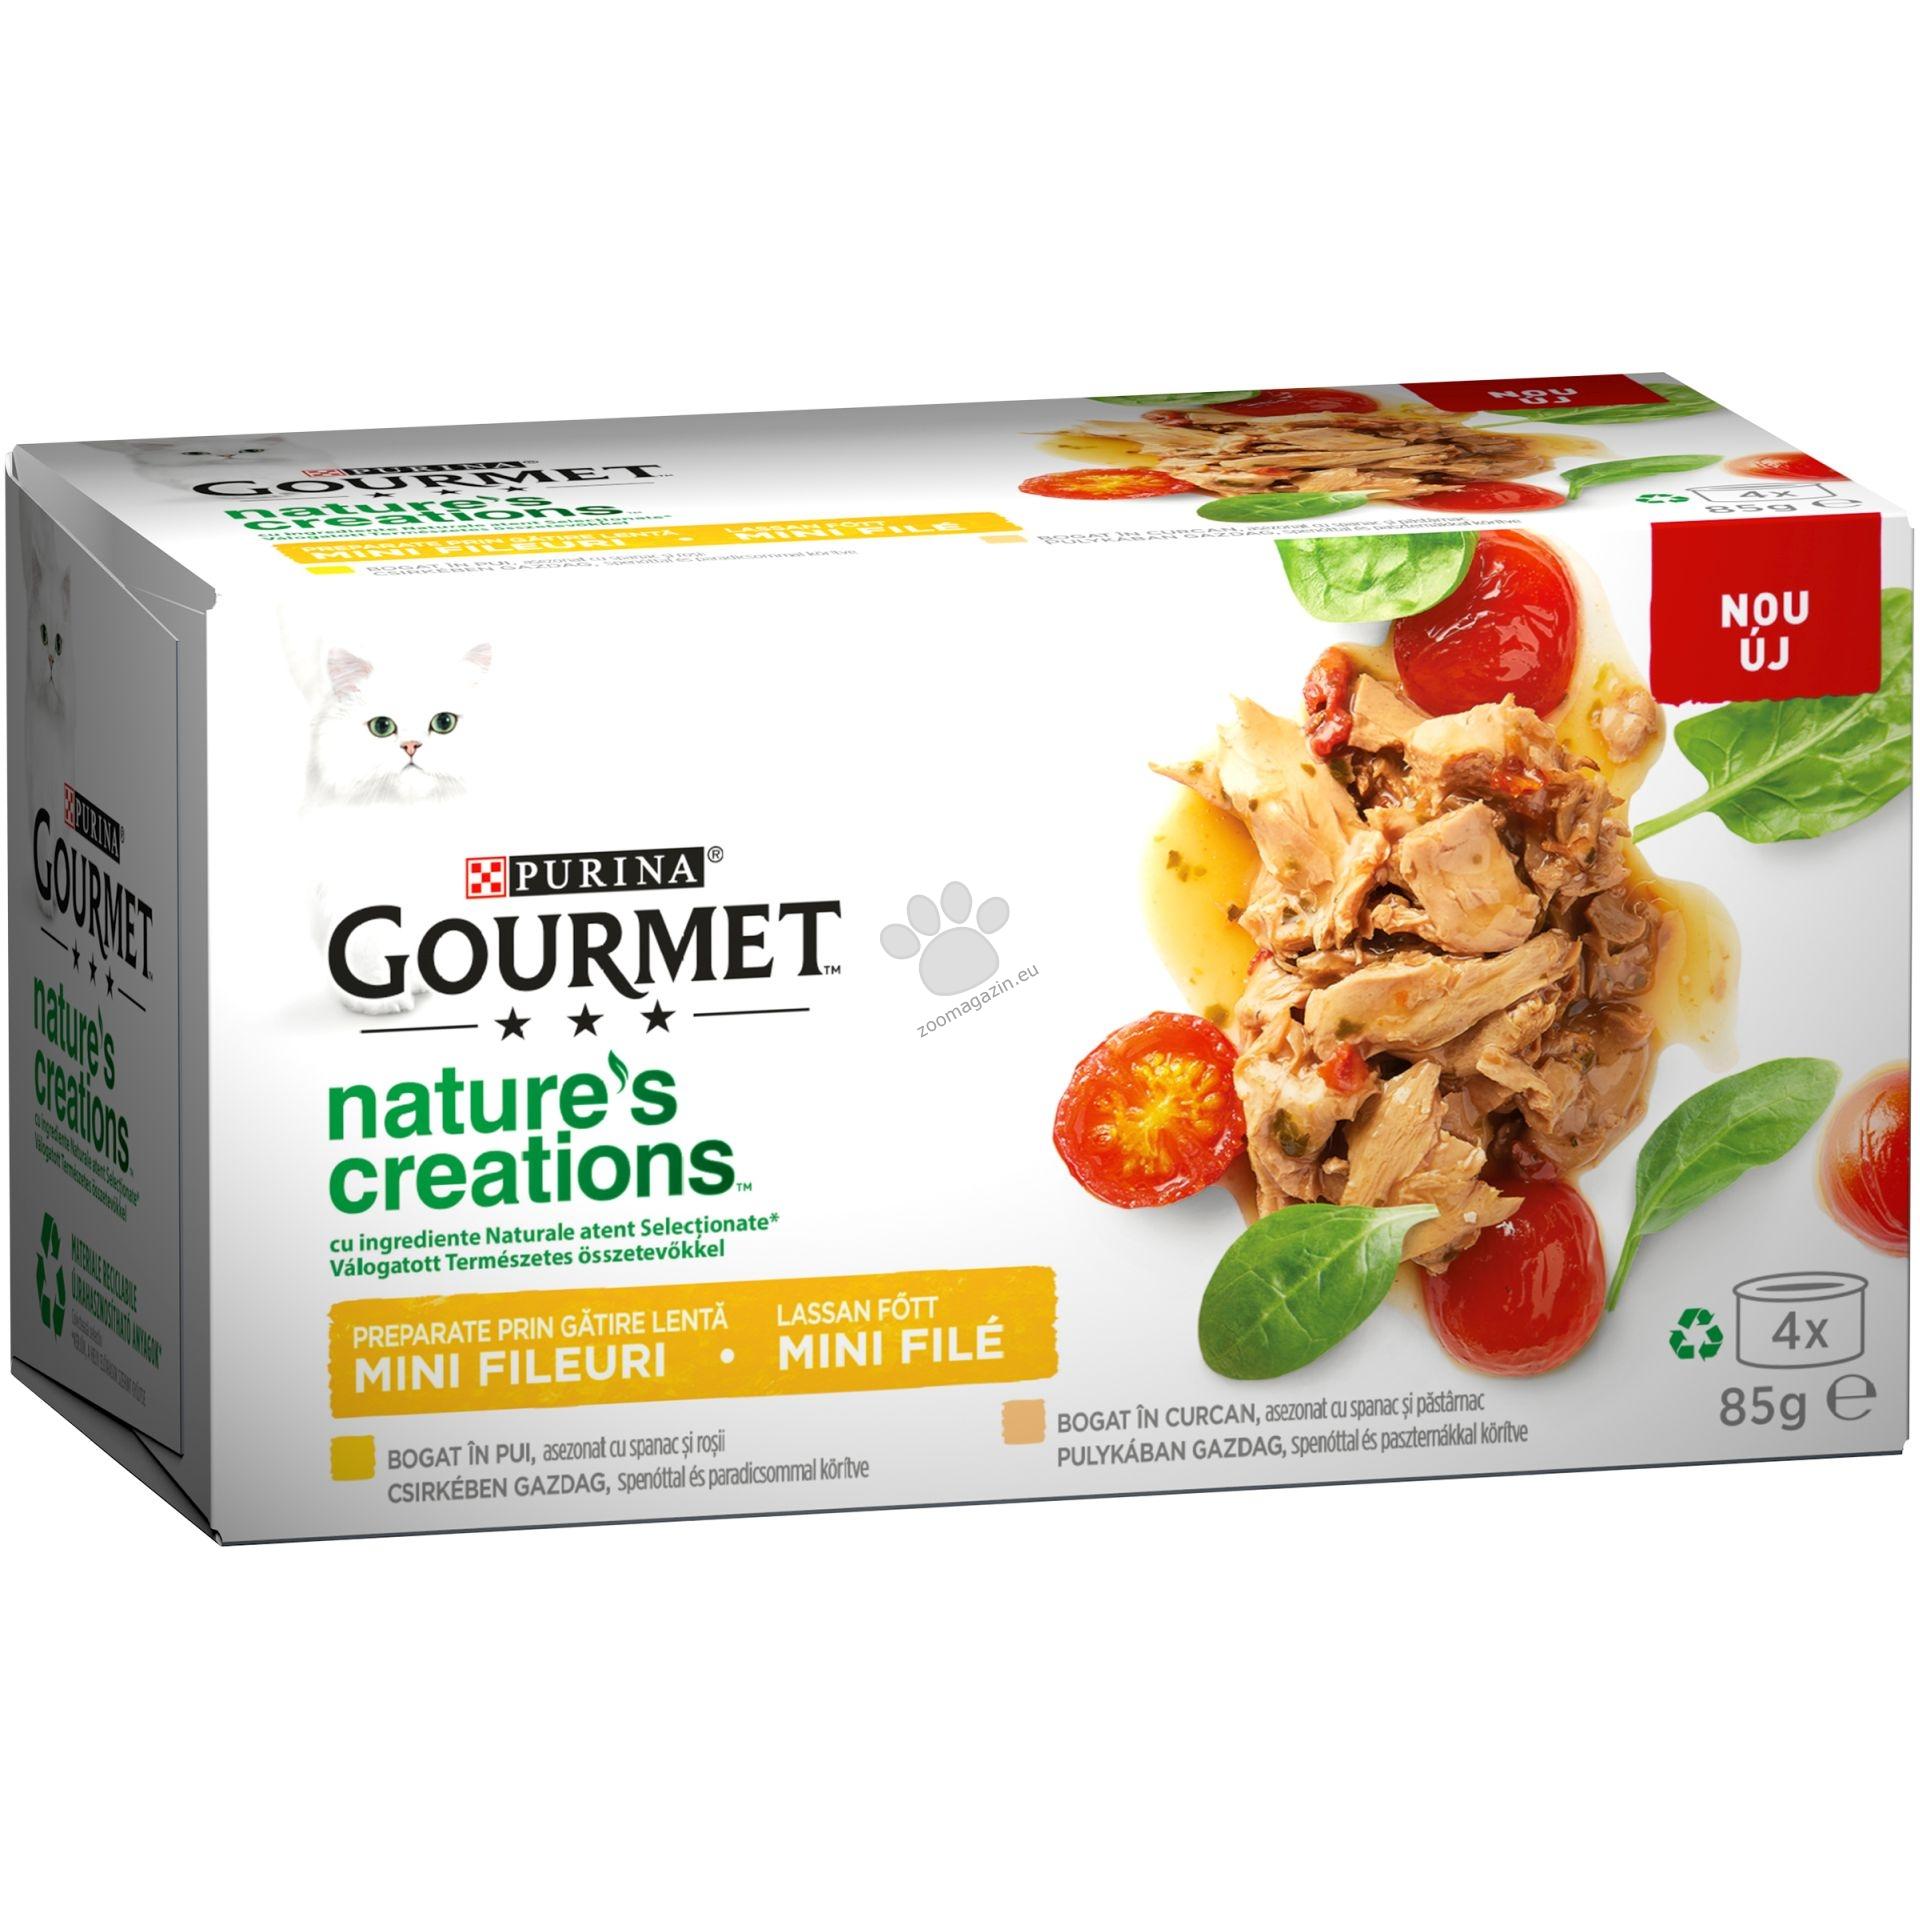 Gourmet Gold Natures Creations Mix - пилешко месо със спанак и домати и пуешко месо със спанак и пащърнак 4 х 85 гр.